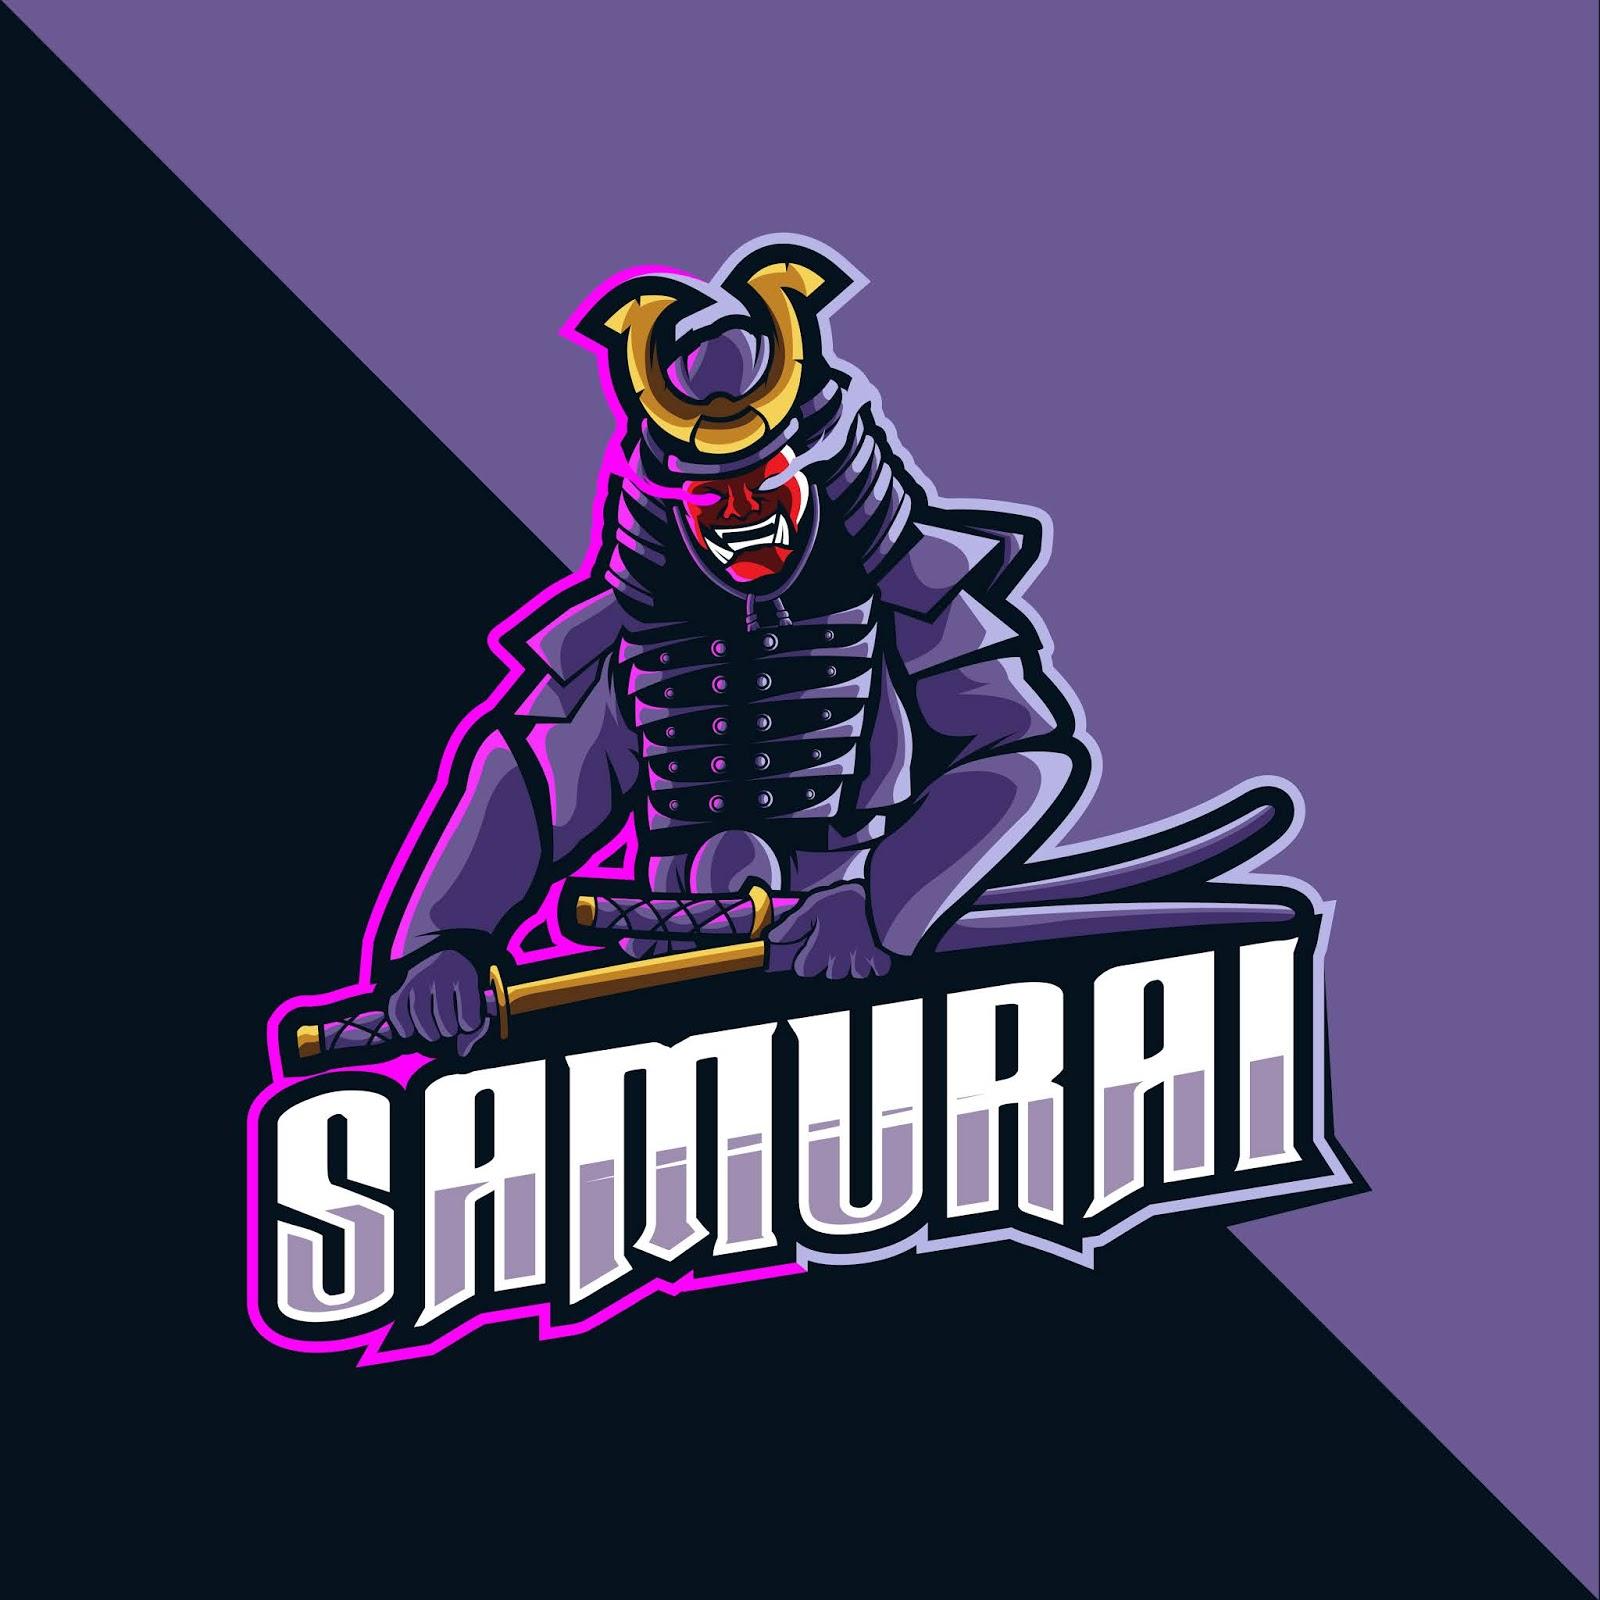 Samurai Mascot Logo Esport Free Download Vector CDR, AI, EPS and PNG Formats